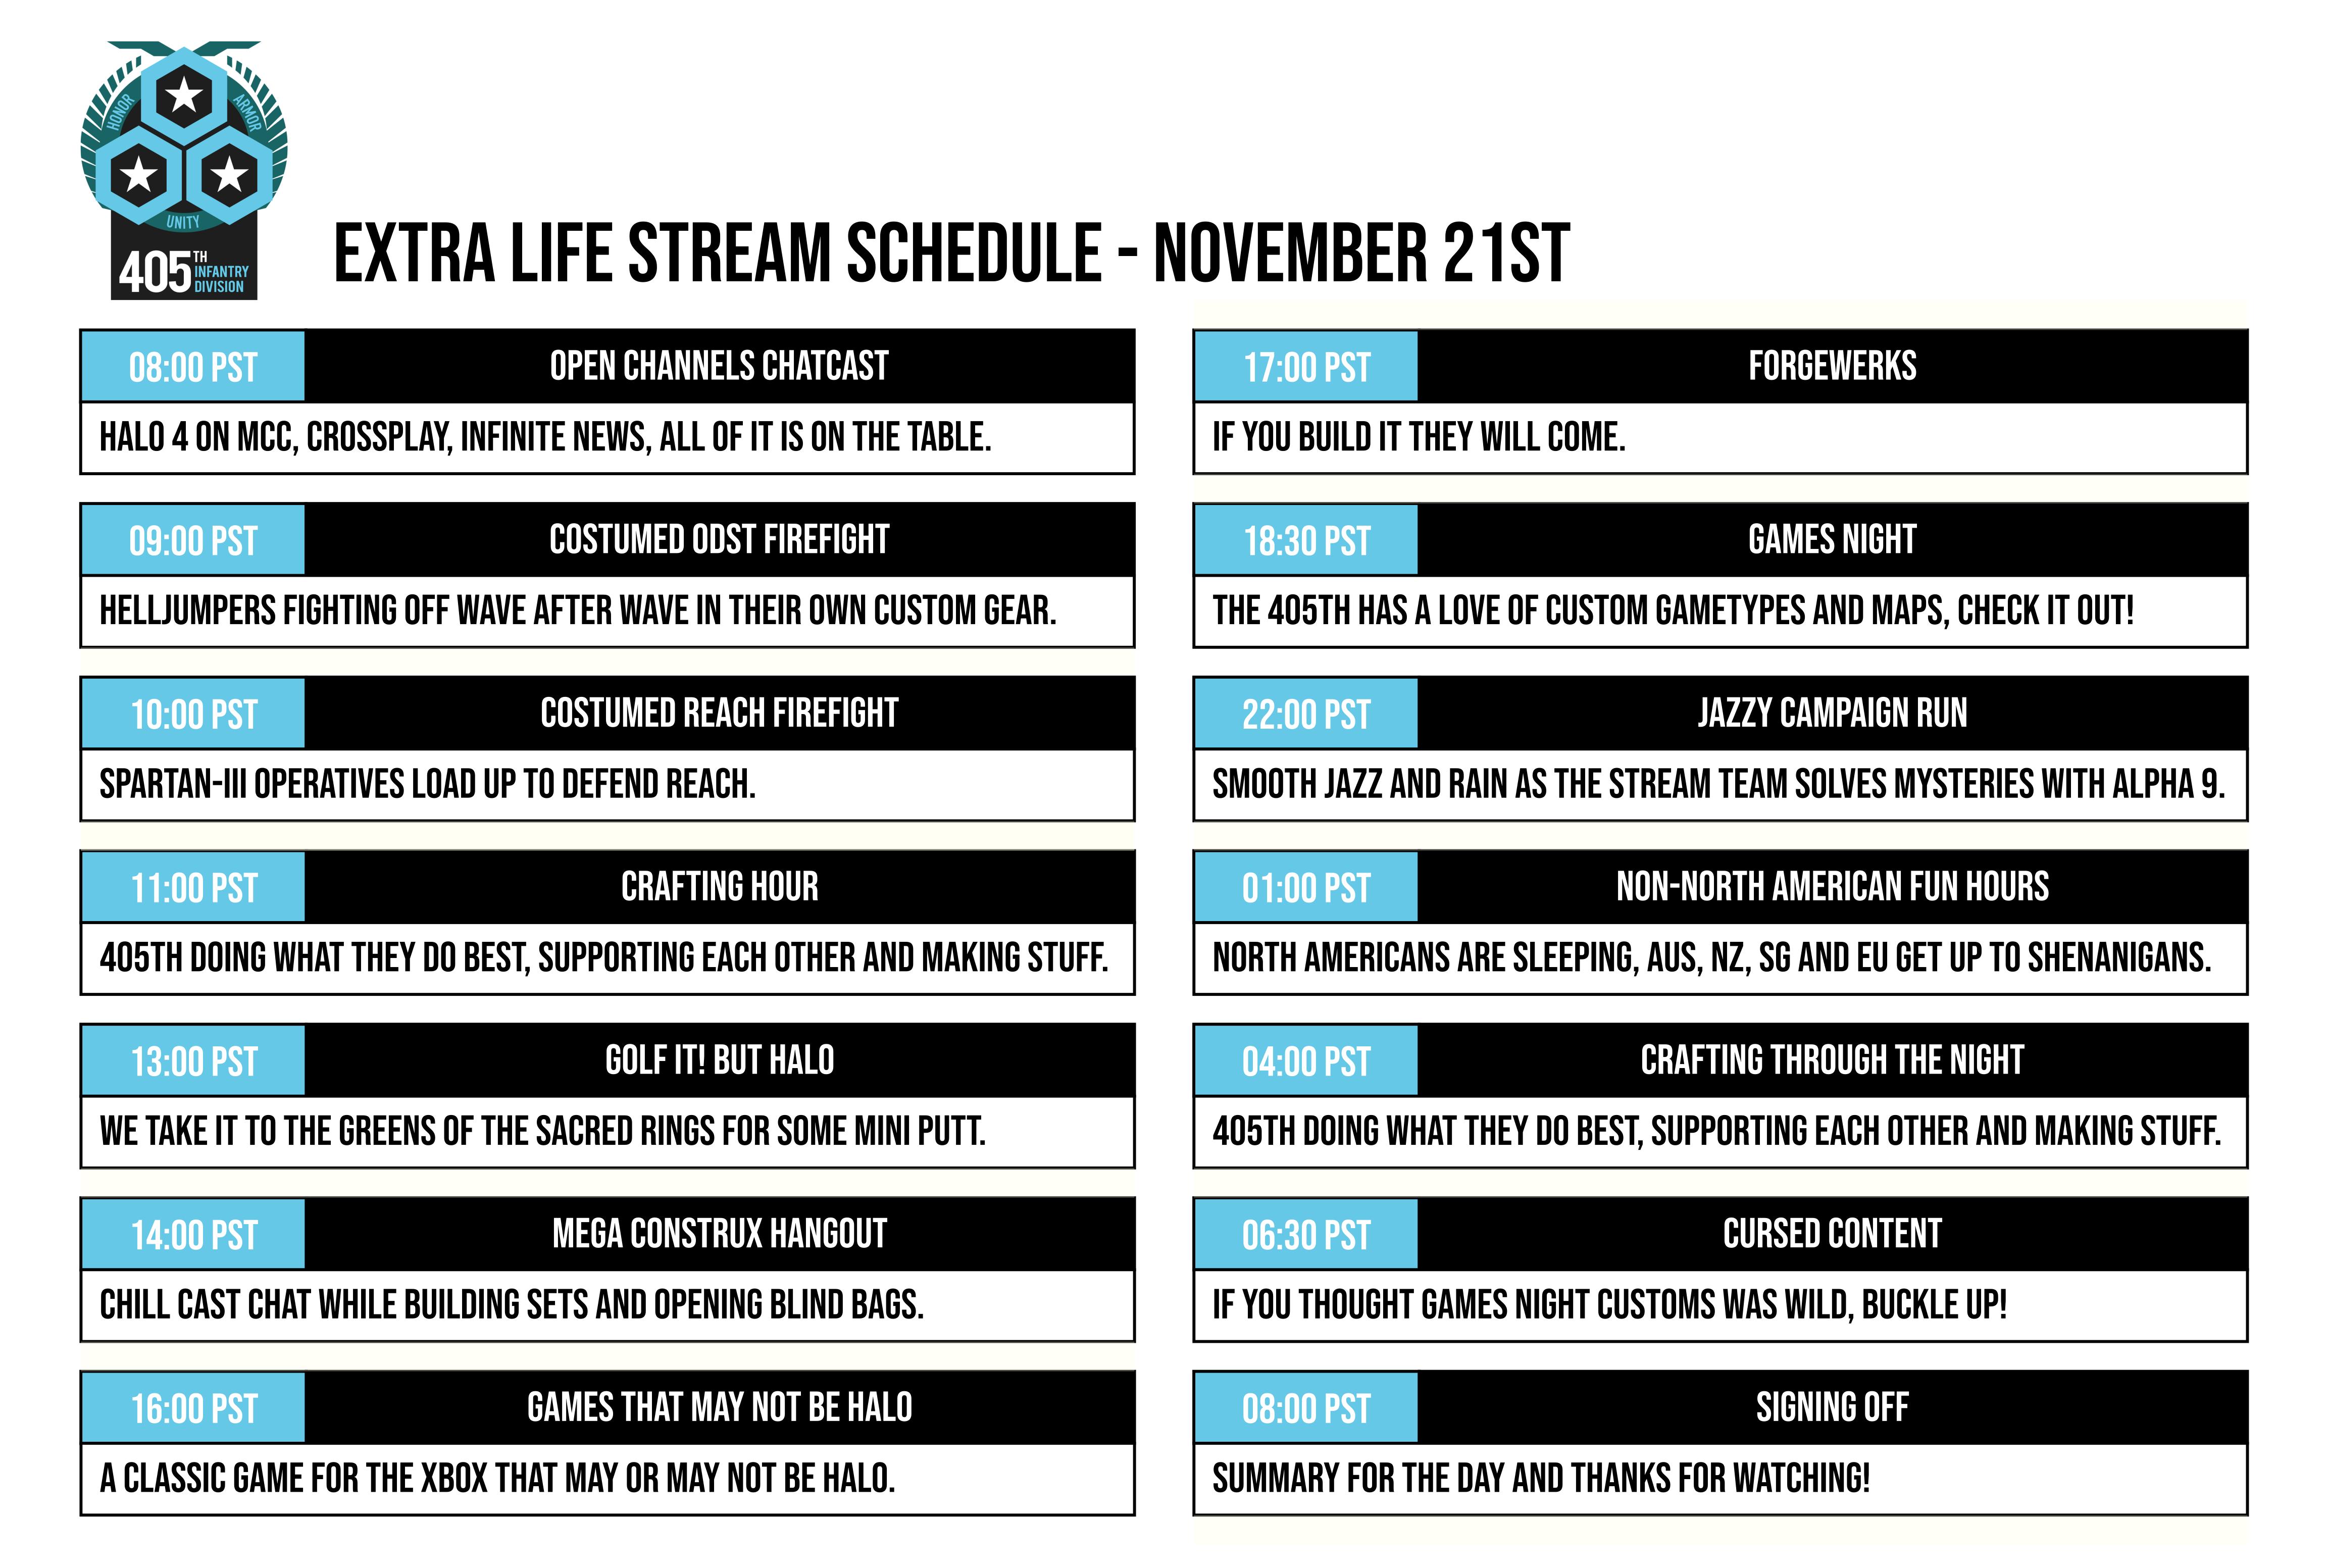 Nov21stStreamSchedule.png